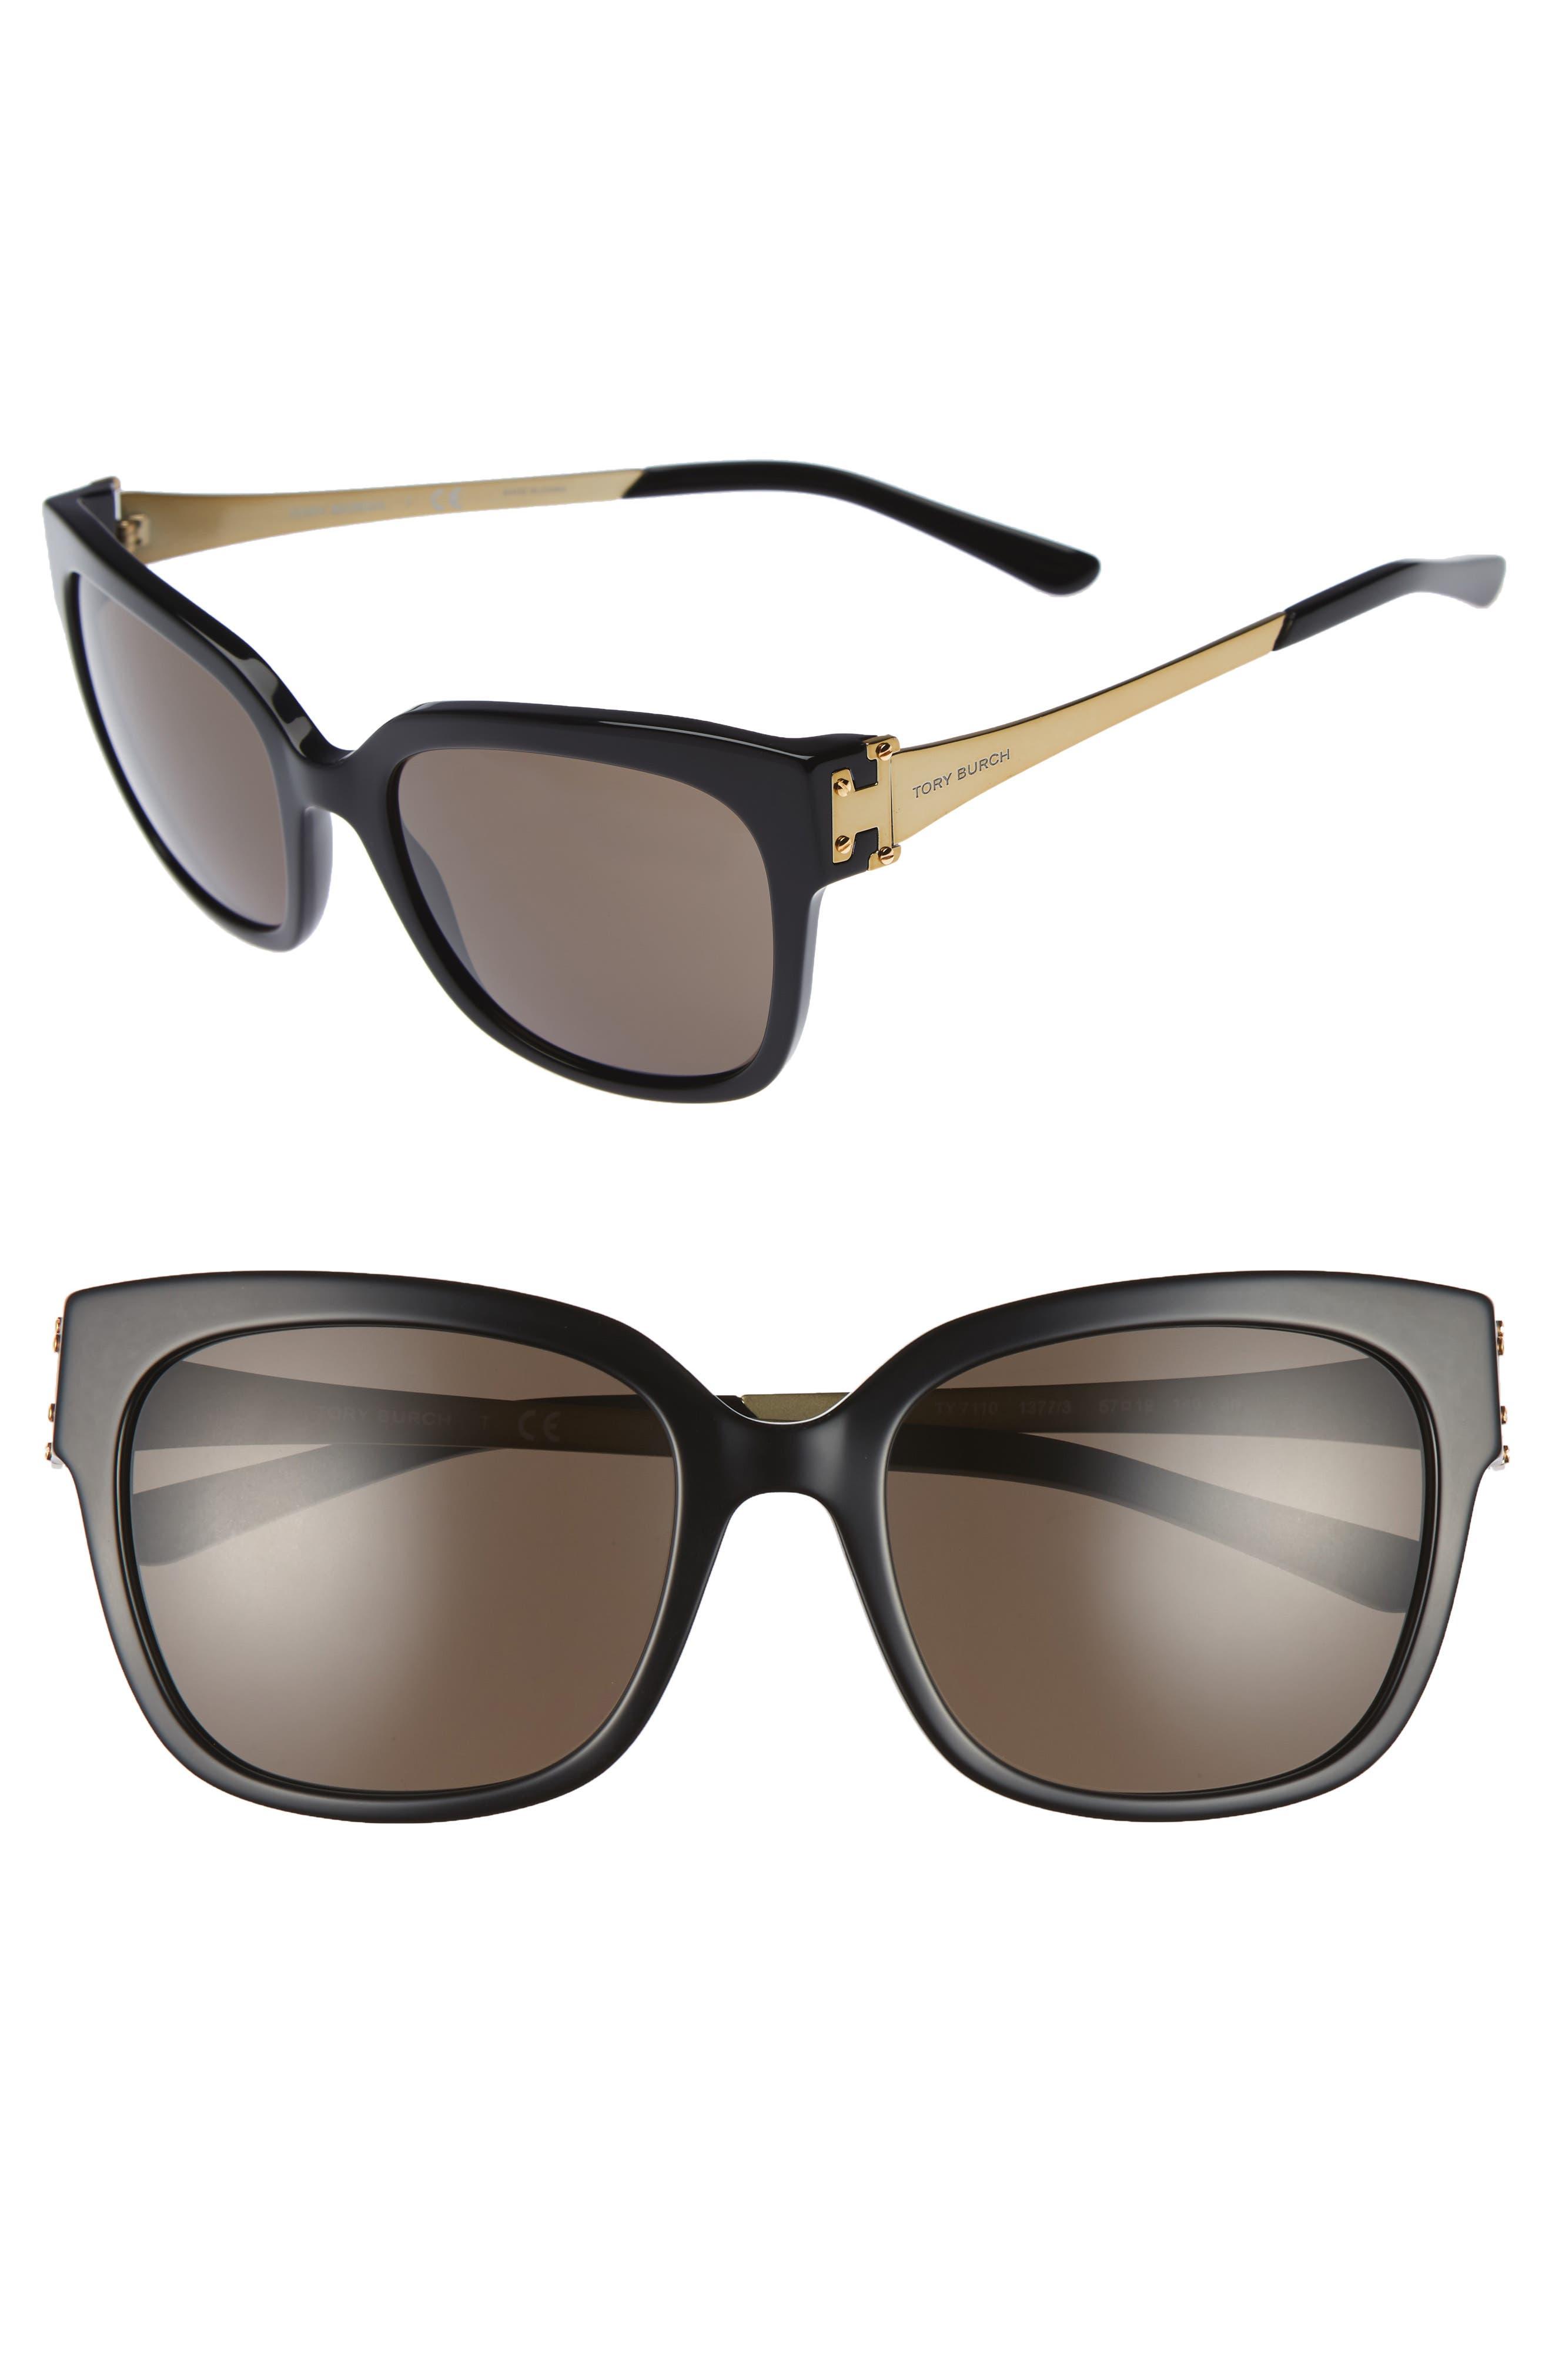 57mm Sunglasses,                             Main thumbnail 1, color,                             001